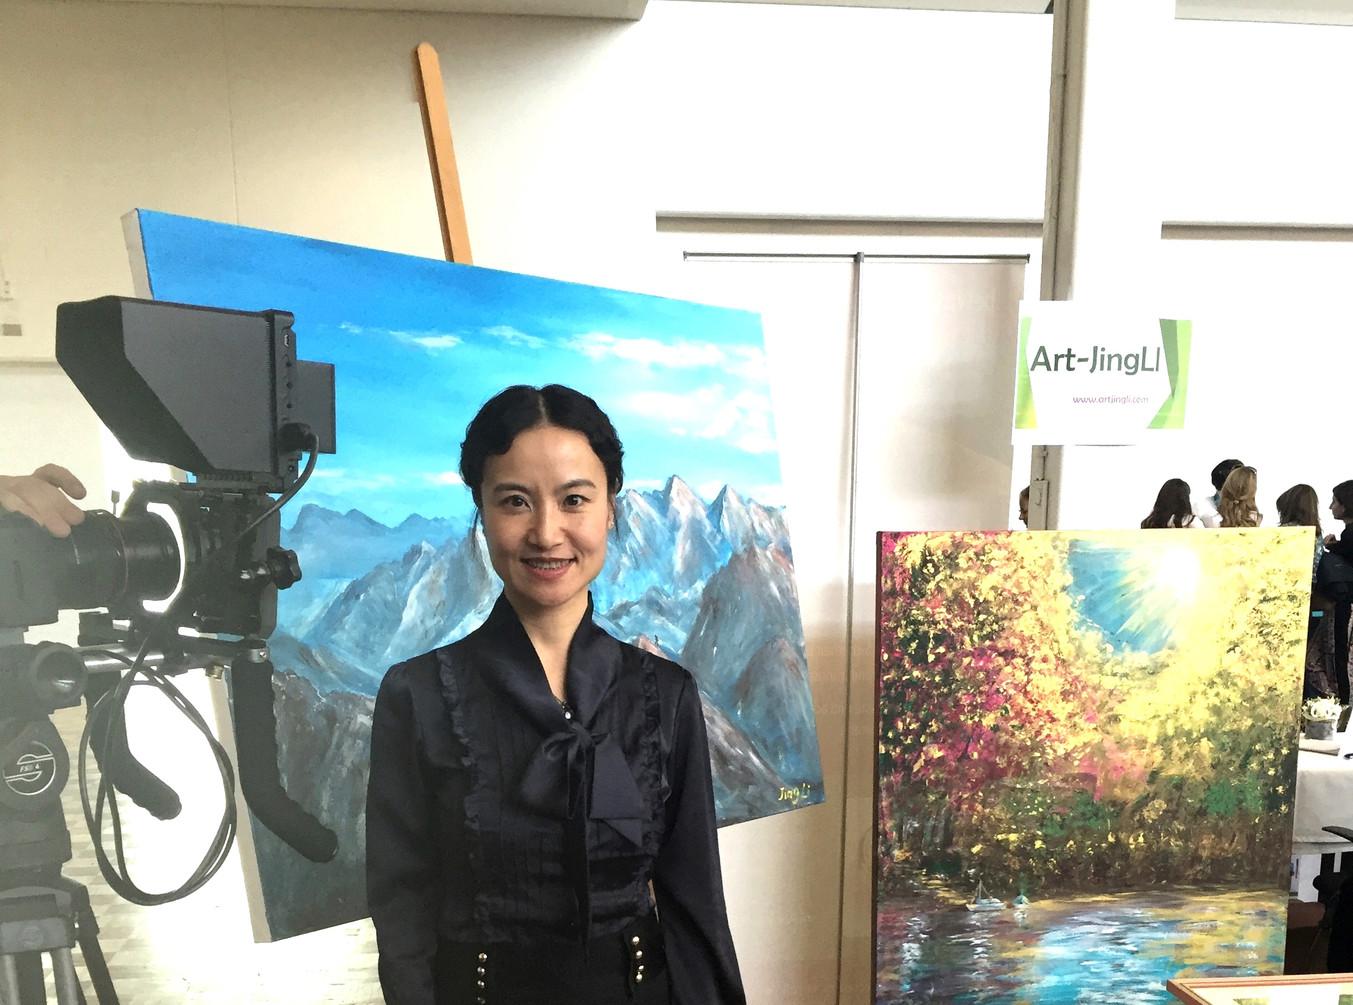 Interview innovative artist